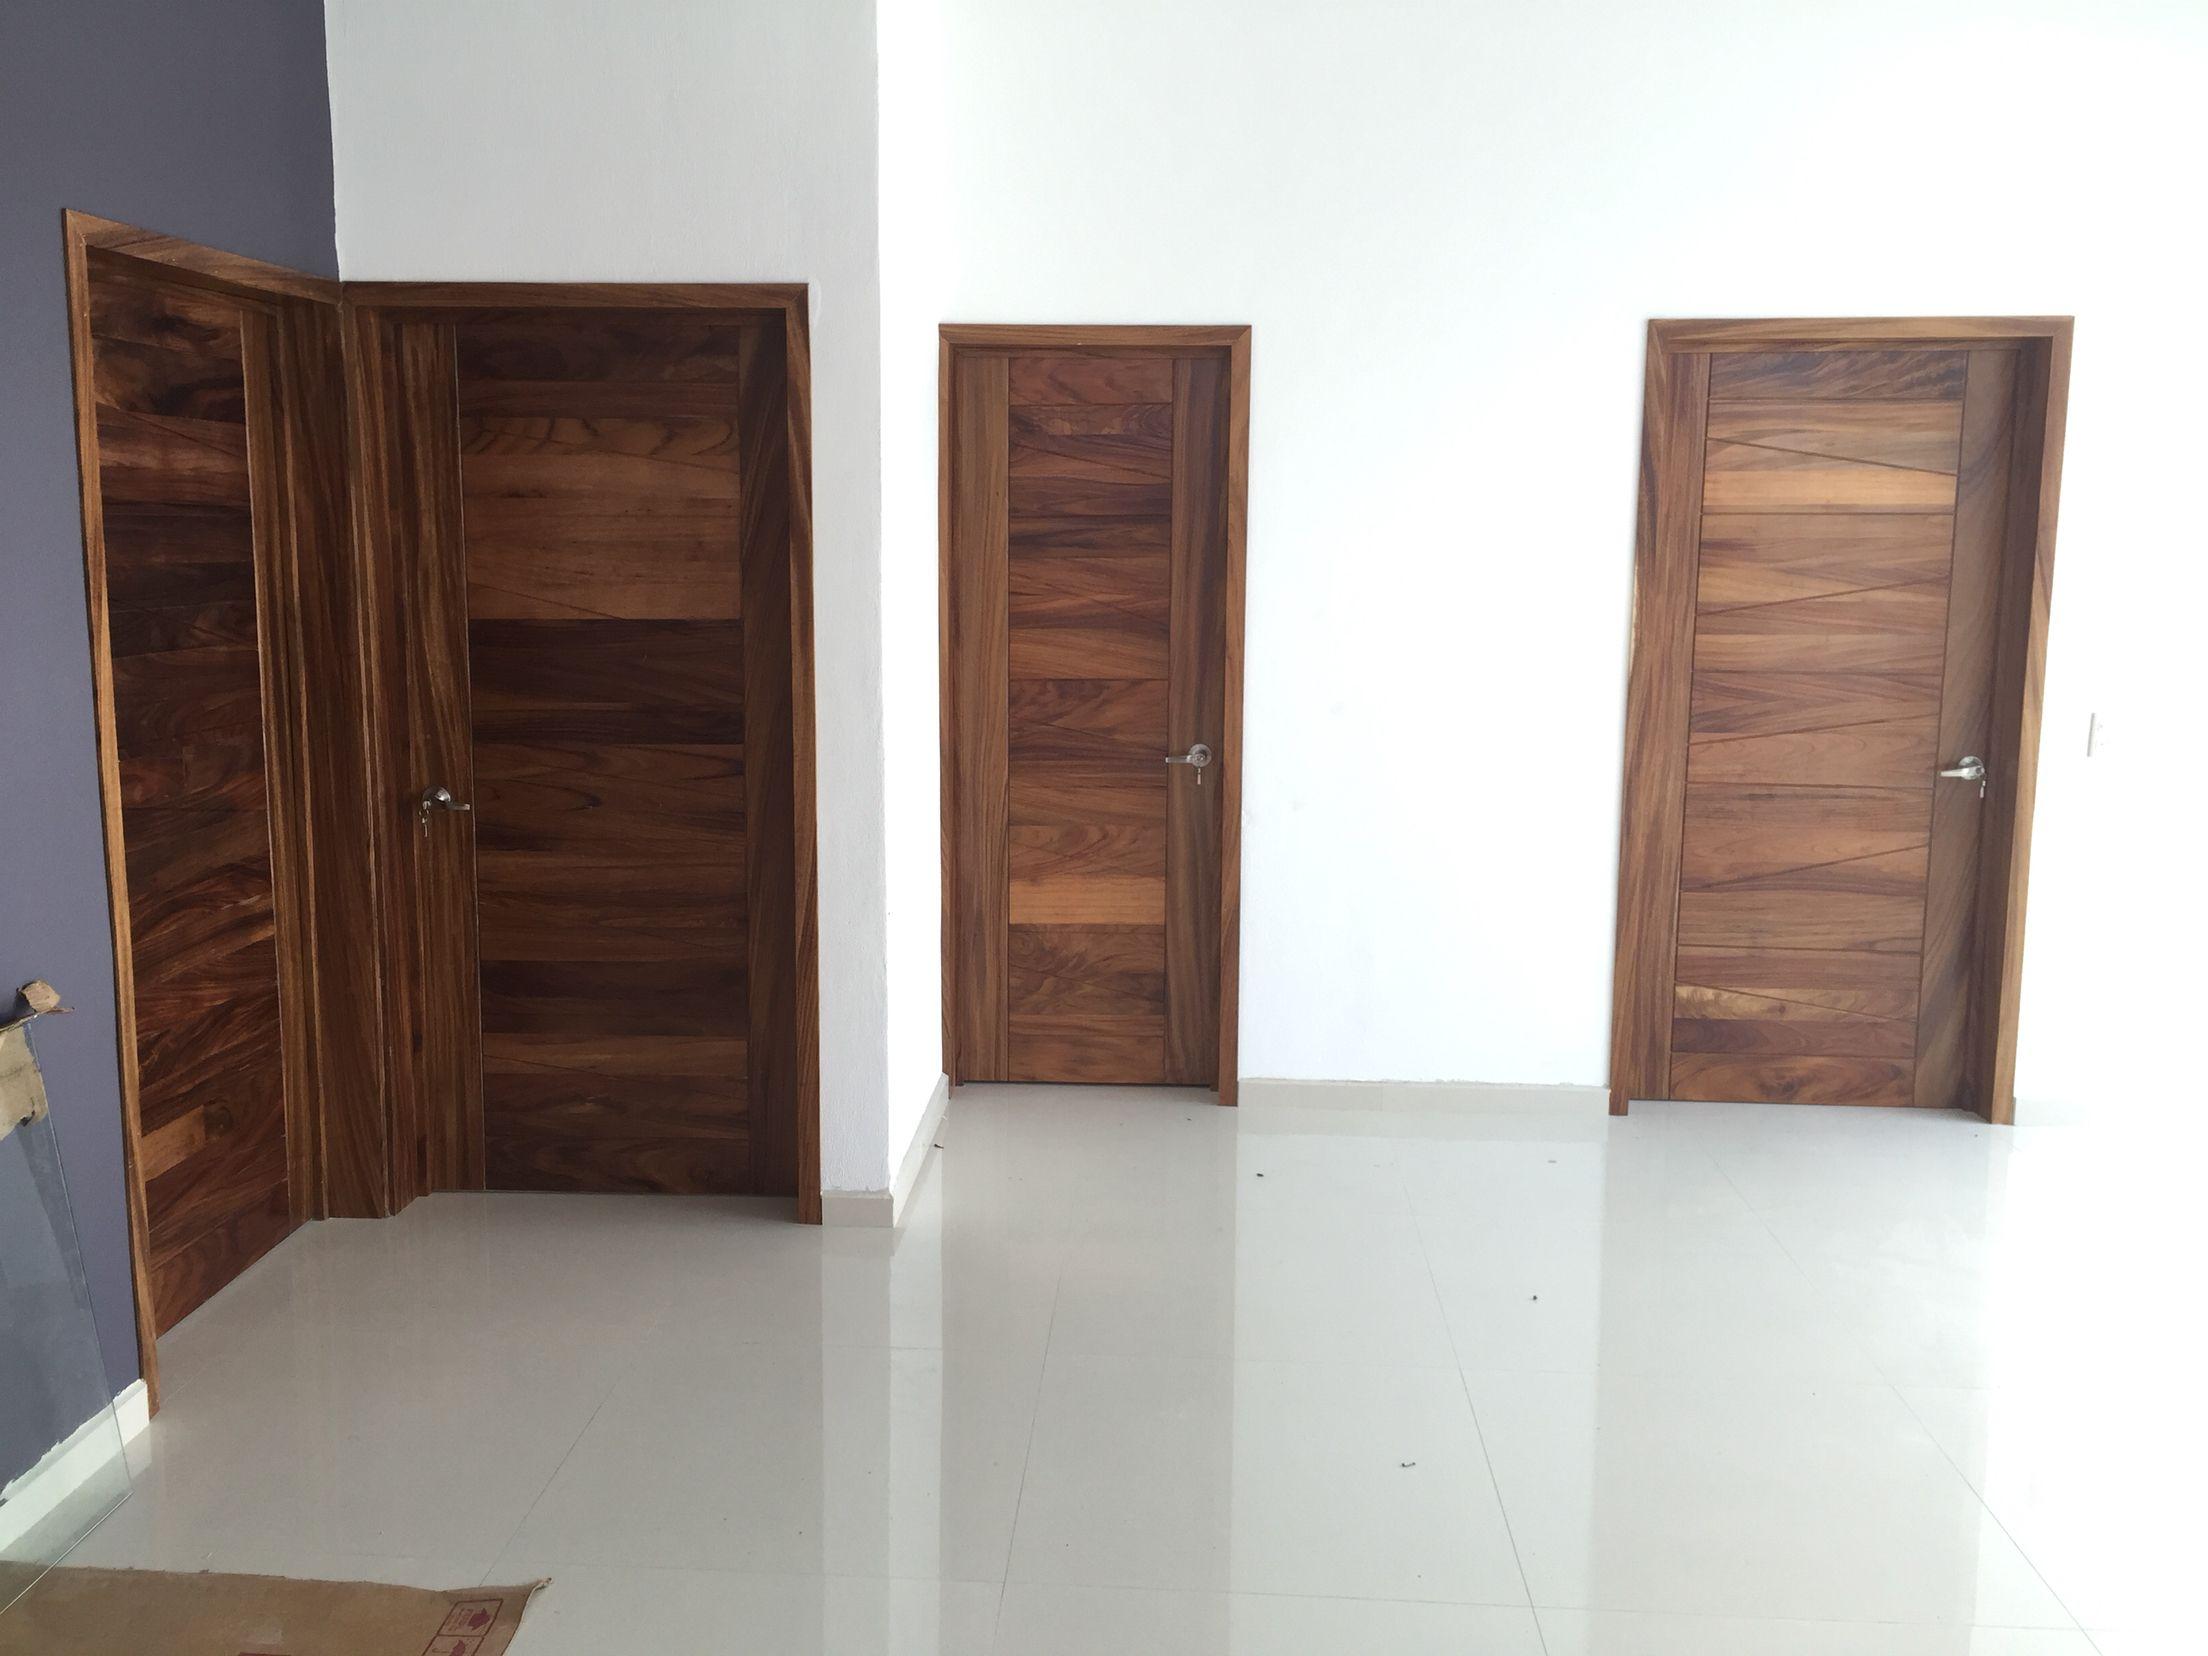 Puertas en madera de parota puertas pinterest madera for Puertas dobles de madera modernas